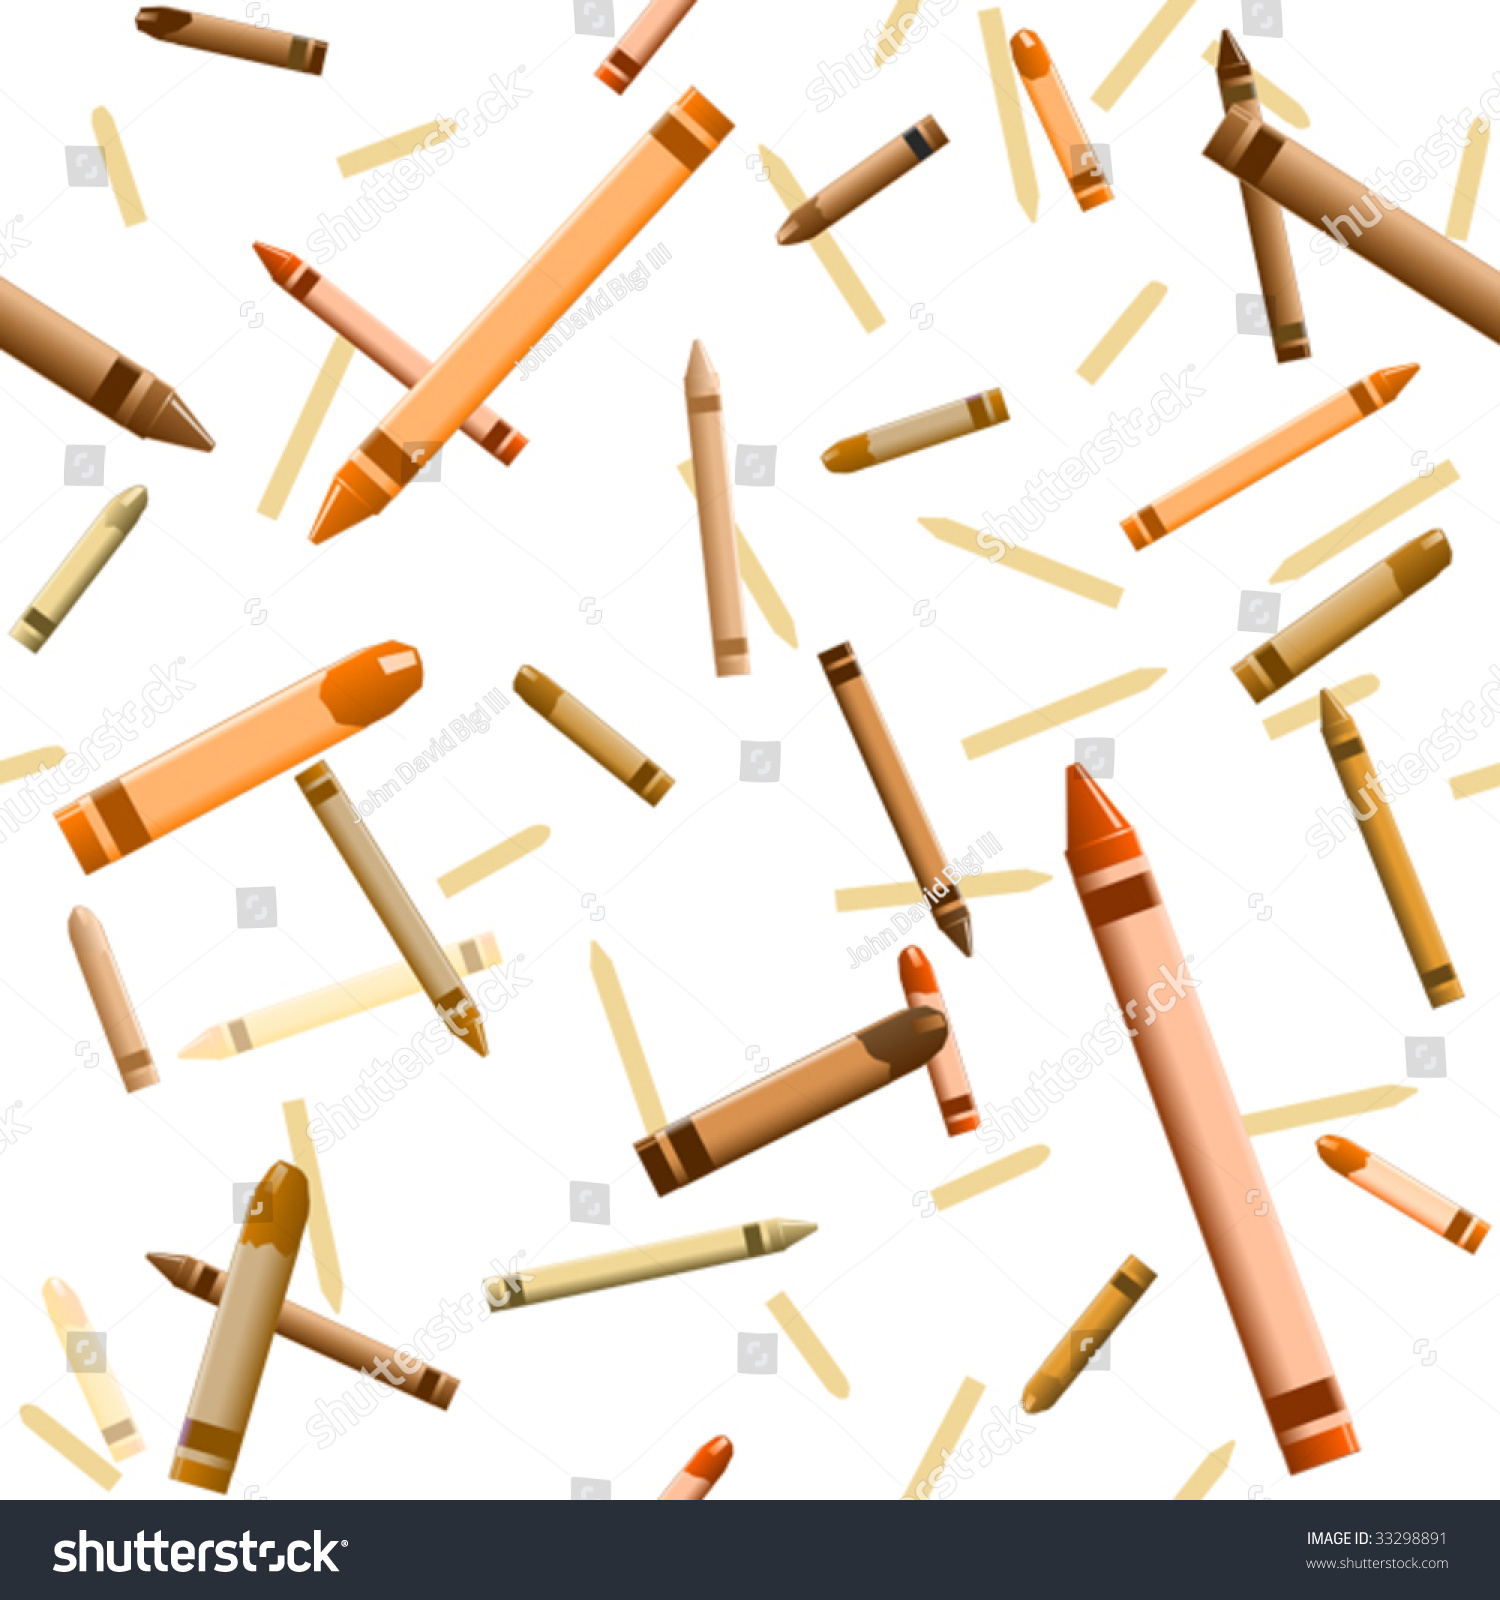 Background Tumbling Orange Vector Crayons Seamless Stock Vector 1500x1600